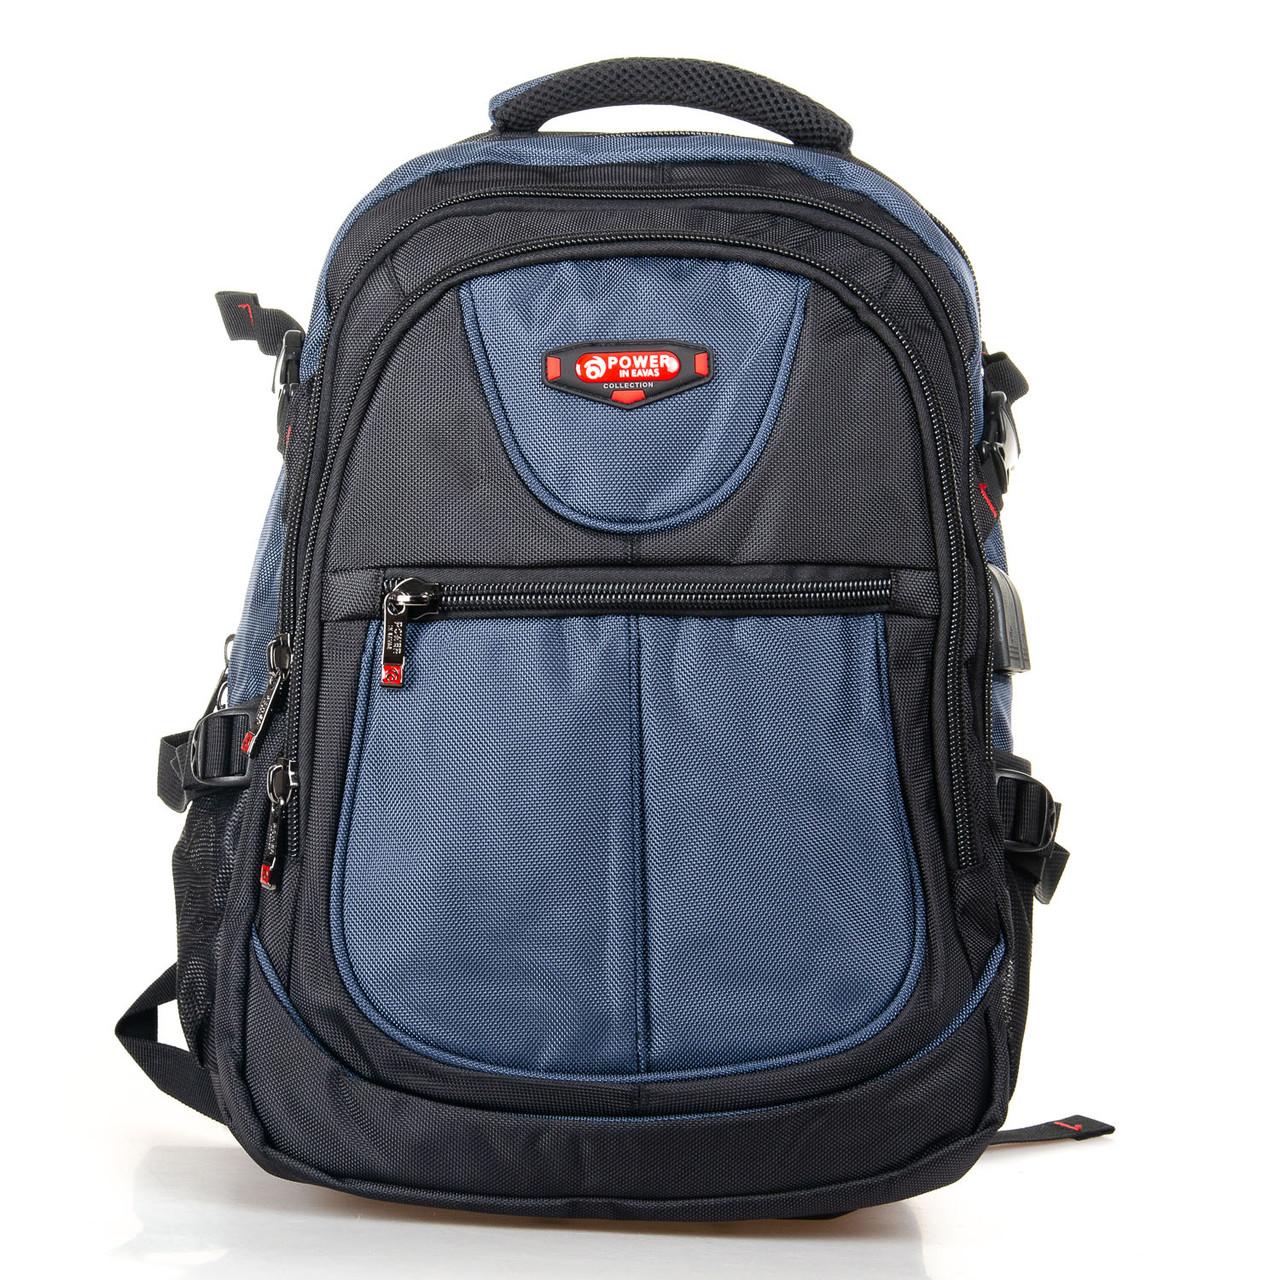 Рюкзак Городской нейлон Power In Eavas 326 black-blue